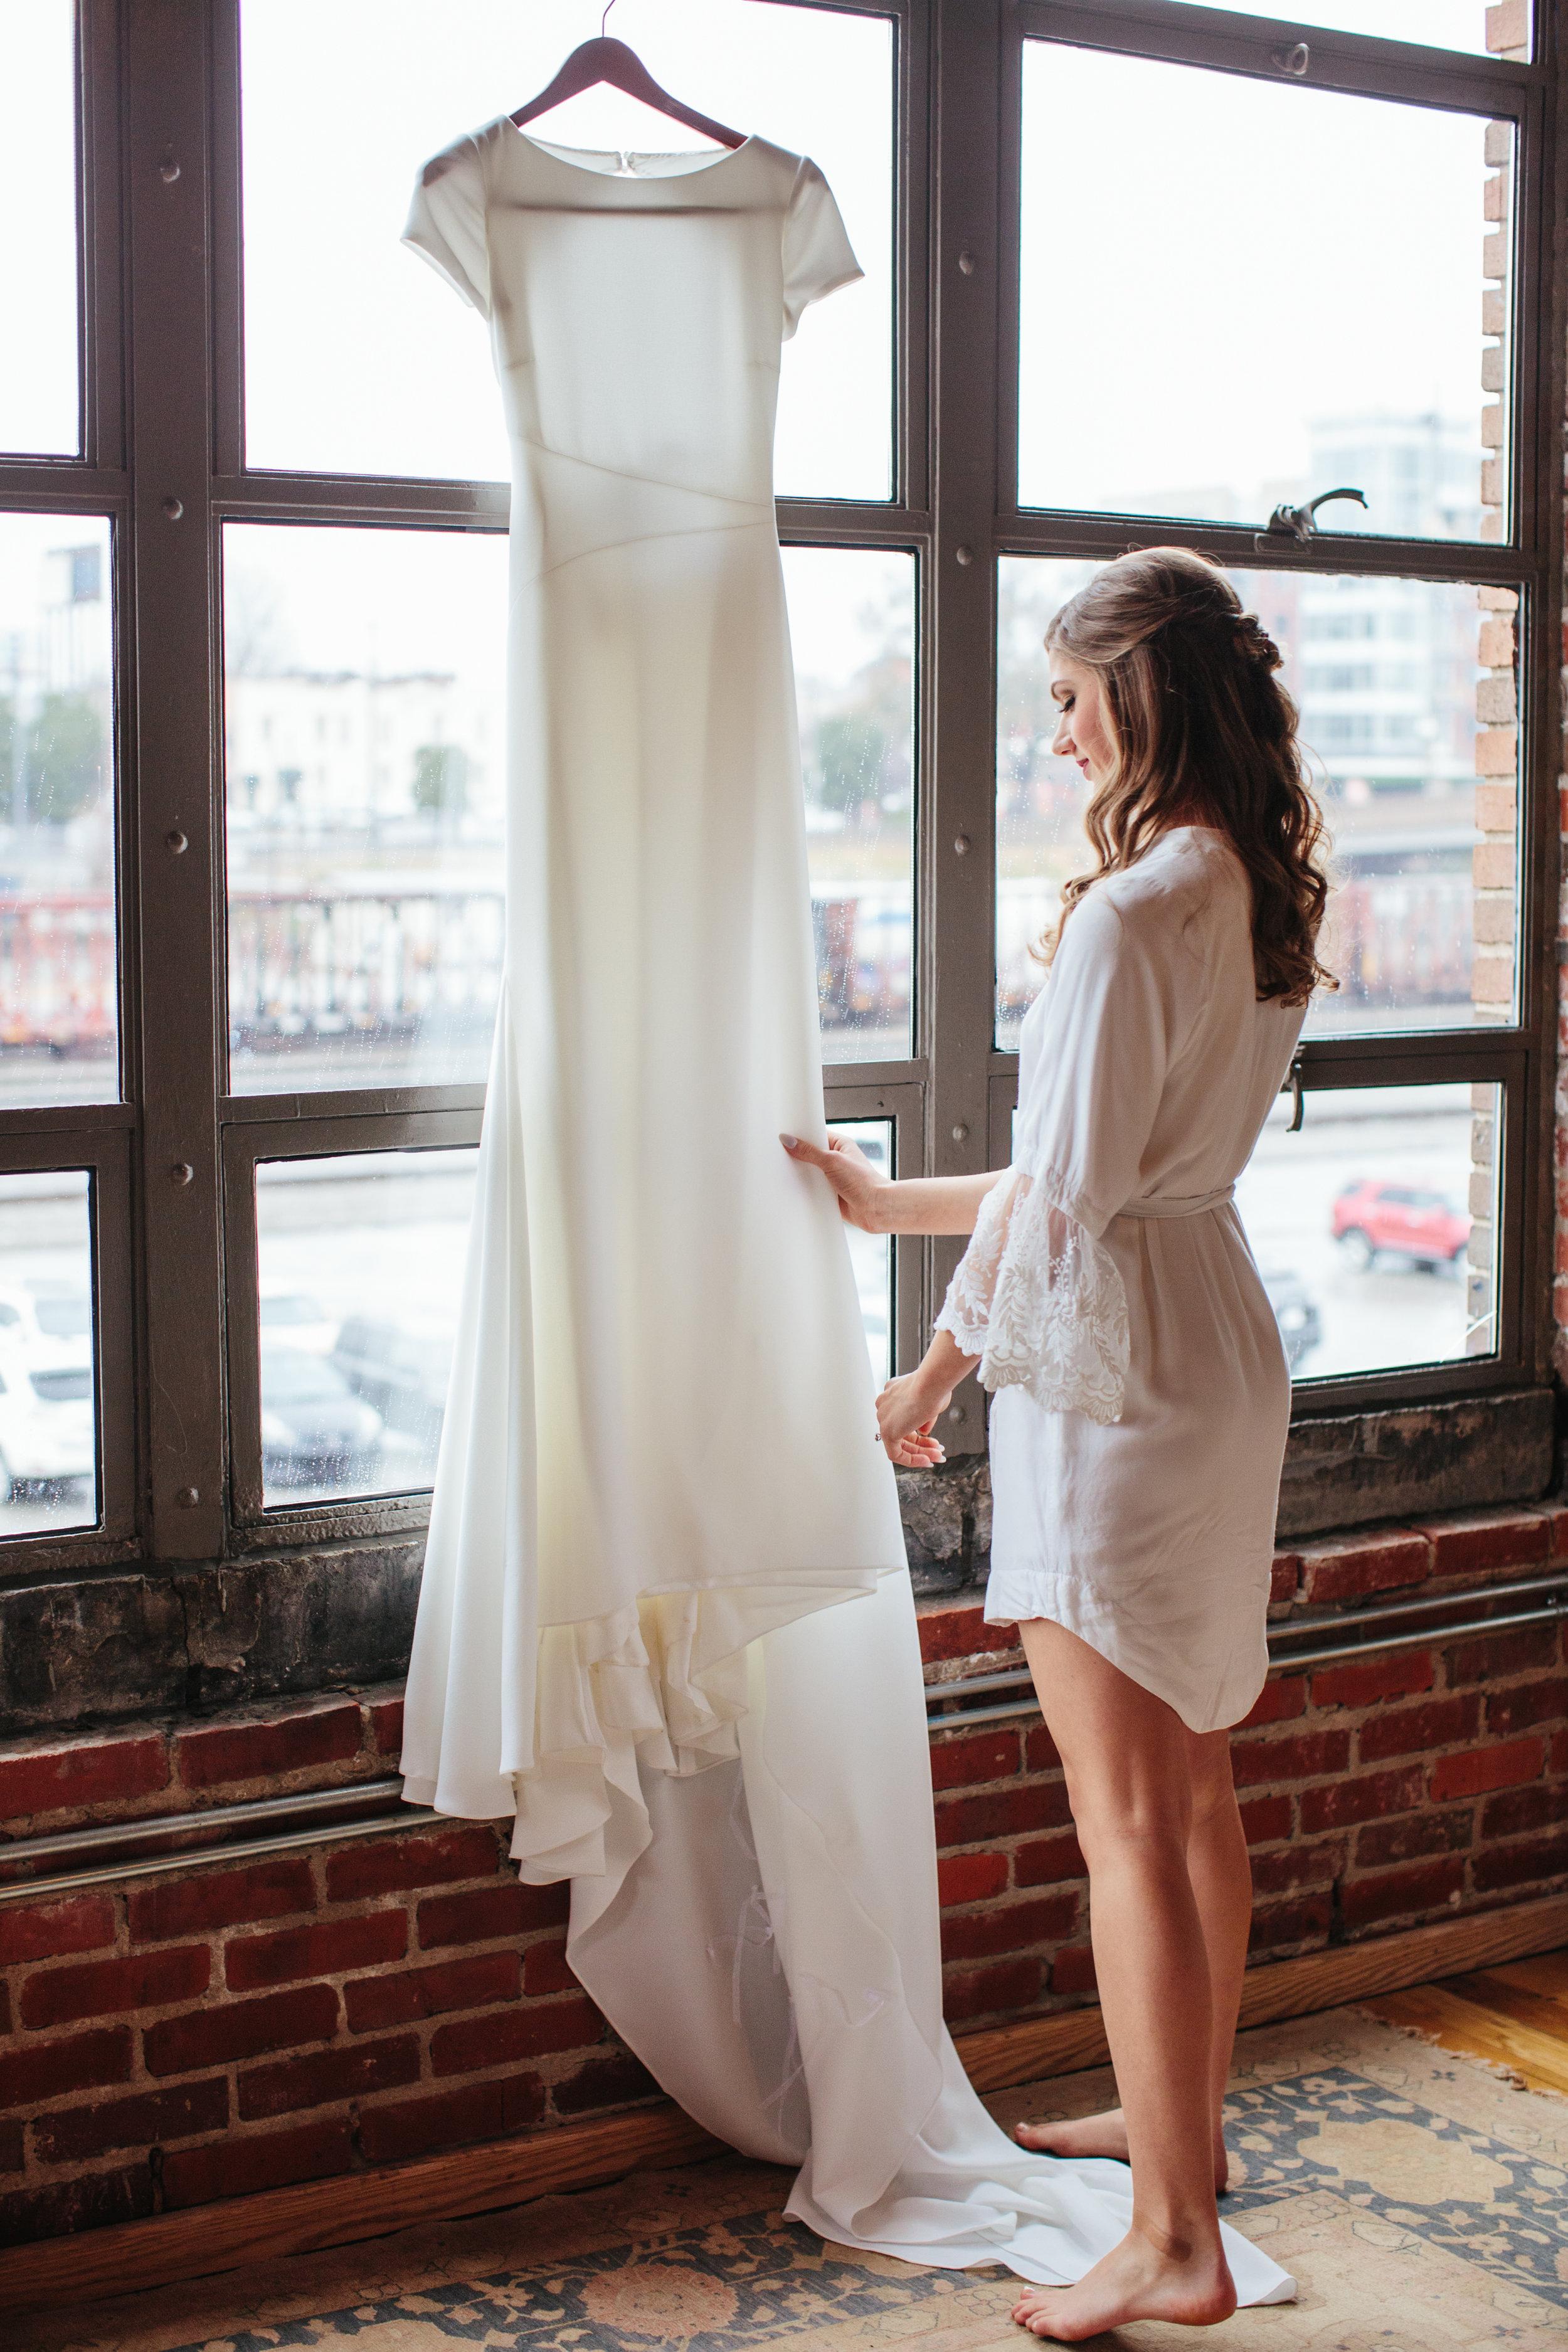 Rache_Brandon_Standard_Wedding_Knoxville_Abigail_Malone_Photography-65.jpg